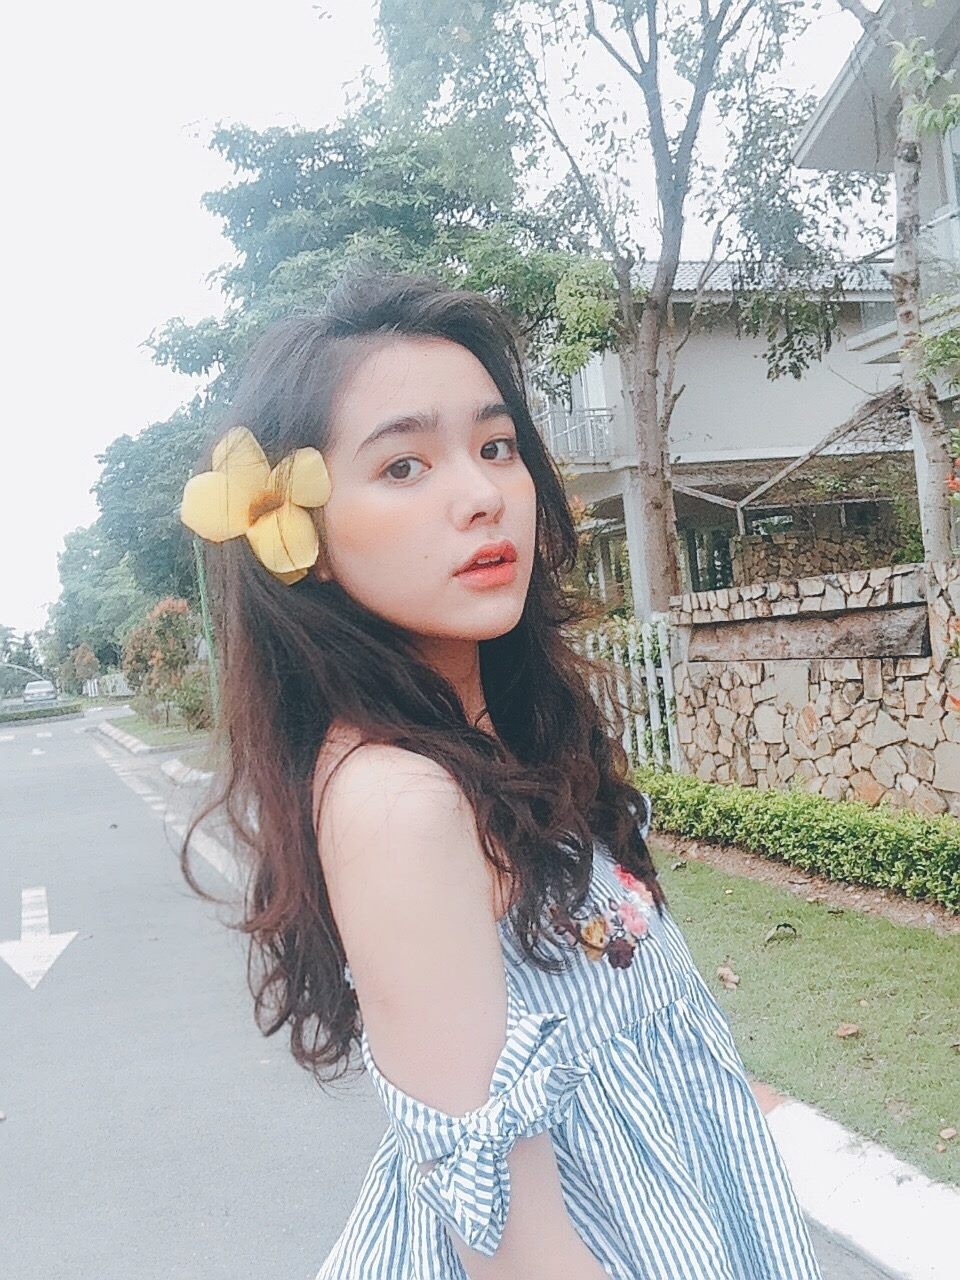 Nhan sac cua nu sinh Tran Phu mang 3 dong mau Thai - Viet - Trung hinh anh 10